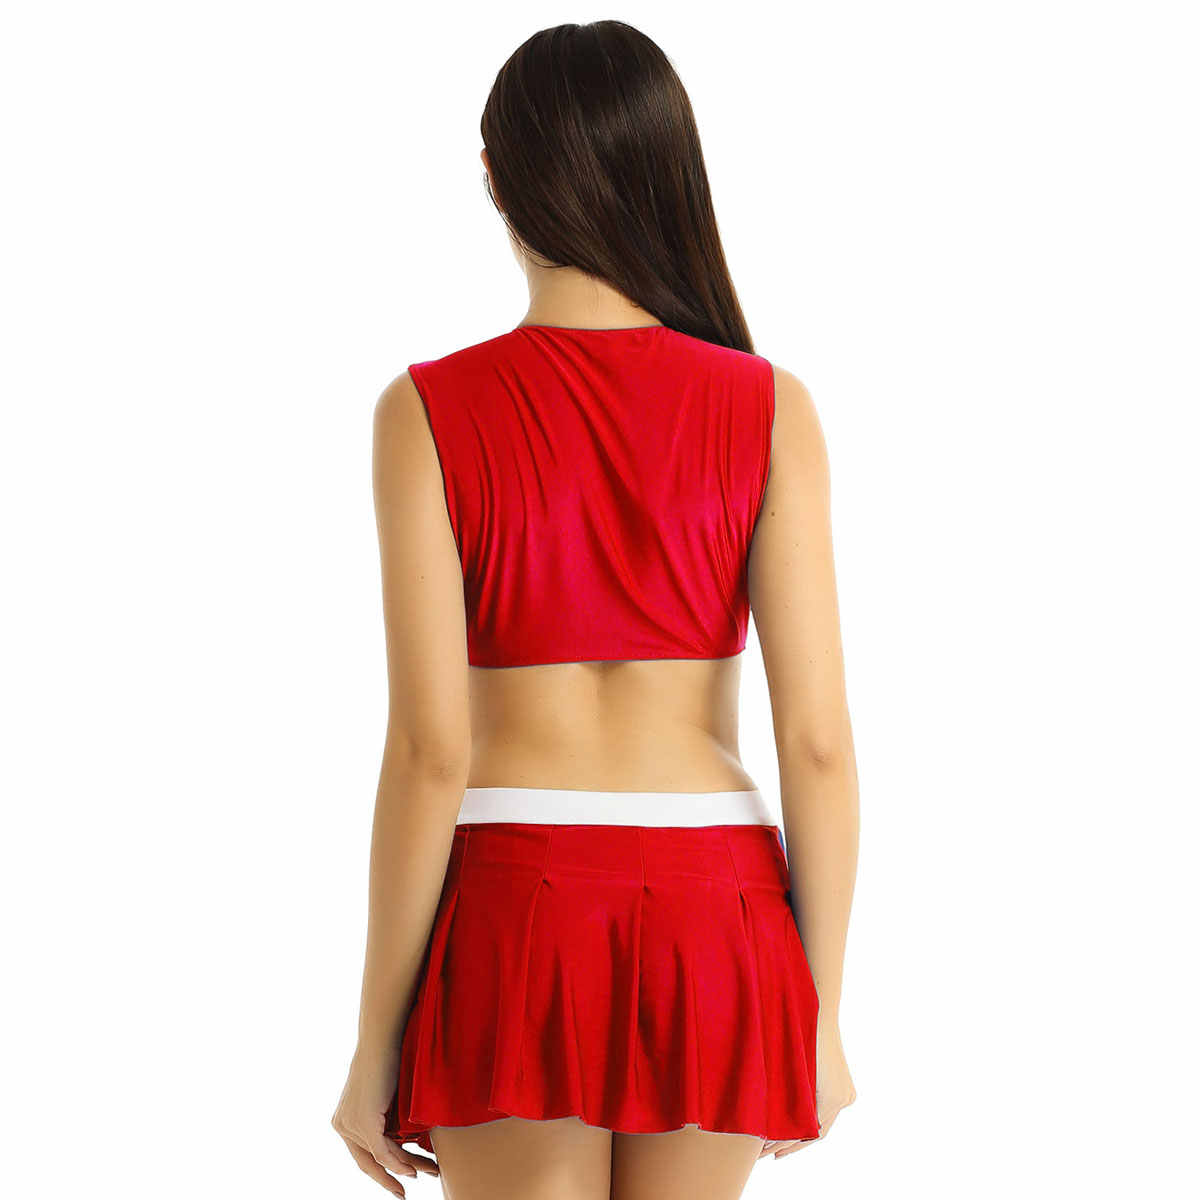 Frauen Cheerleader Kostüm Cheerleading Crop Top mit Mini Plissee Rock Schülerin Cheerleader Dancewear Cosplay Sport Uniform